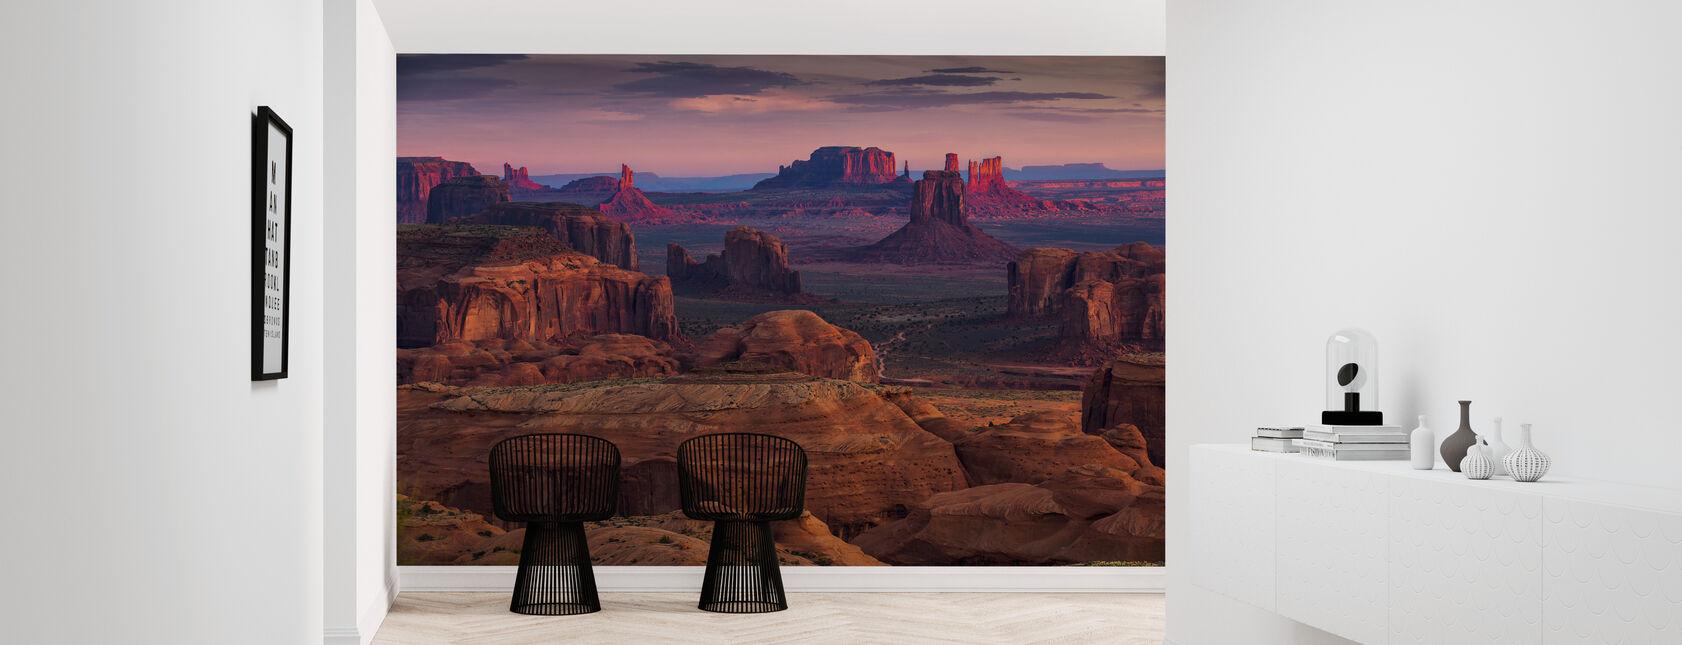 Monument Valley - Wallpaper - Hallway